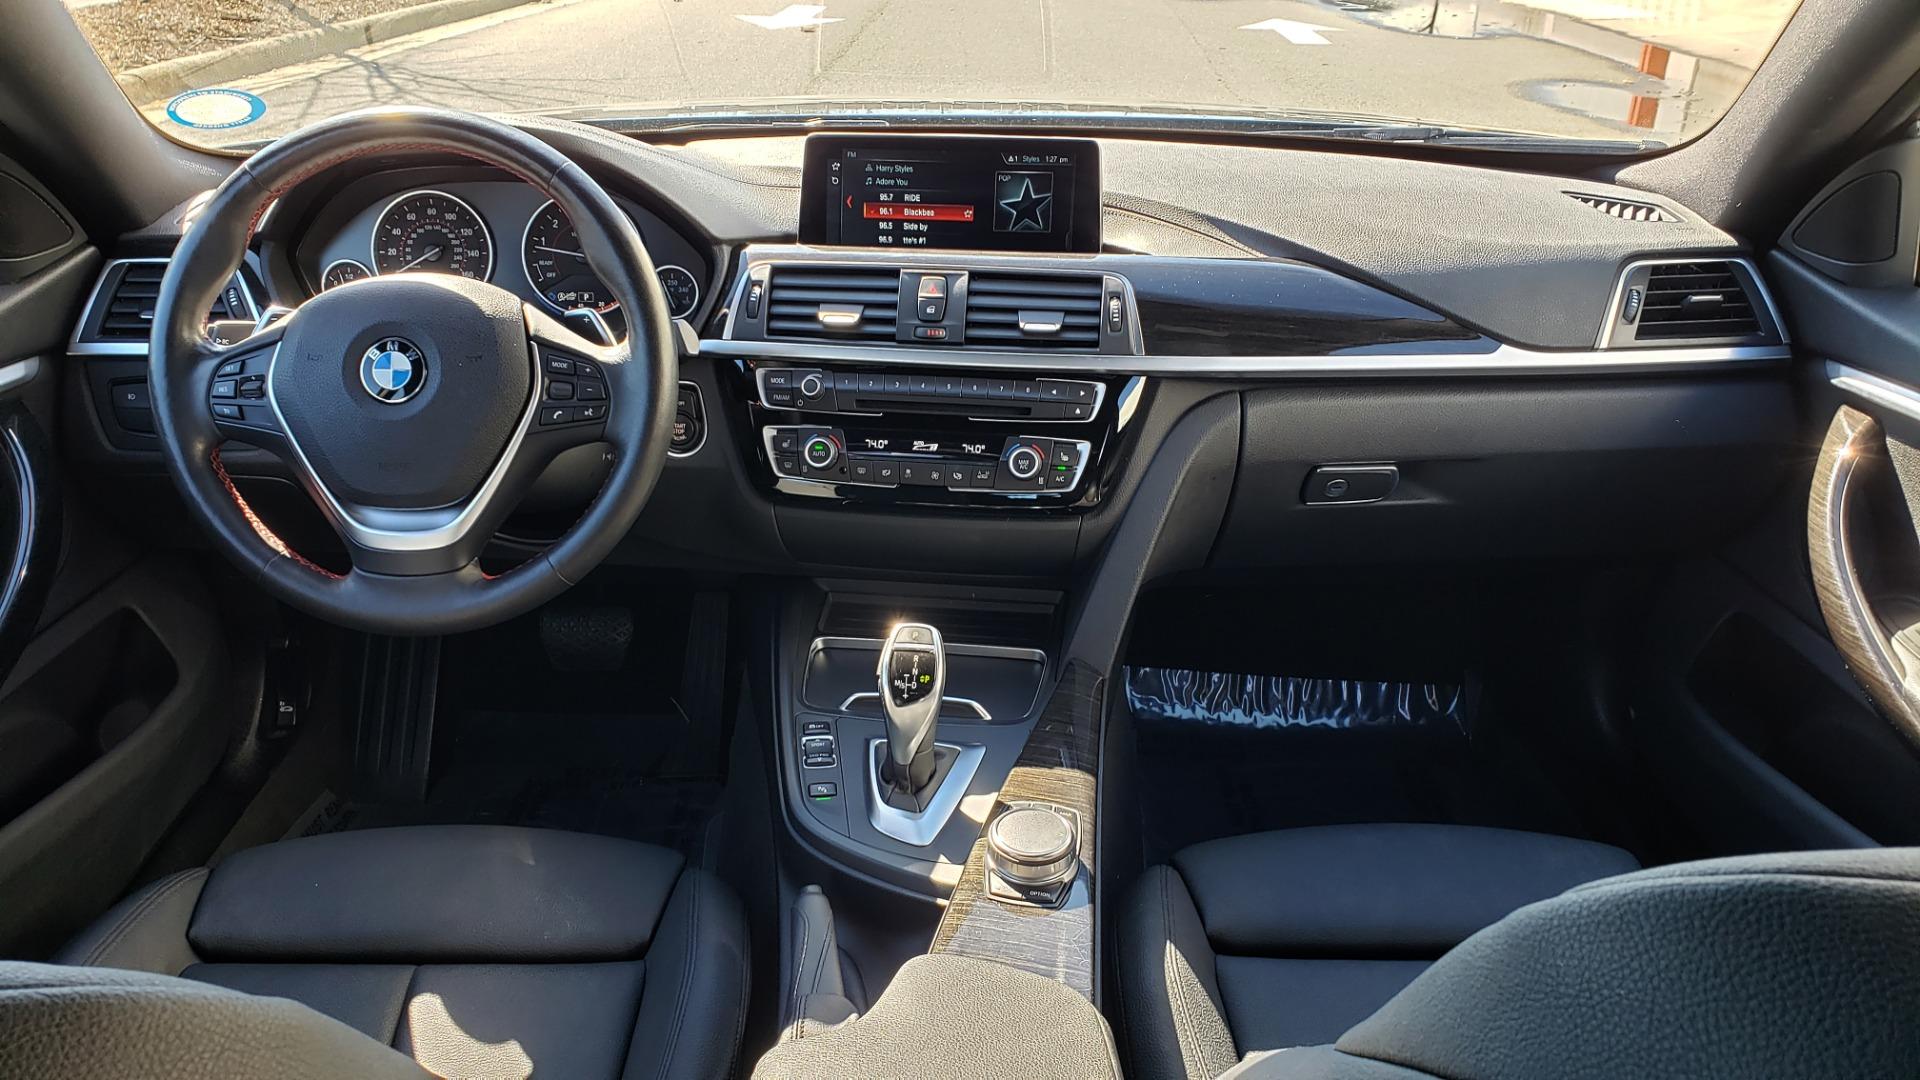 Used 2018 BMW 4 SERIES 430IXDRIVE / PREMIUM / NAV / SUNROOF / ESSENTIALS PKG for sale $29,495 at Formula Imports in Charlotte NC 28227 77